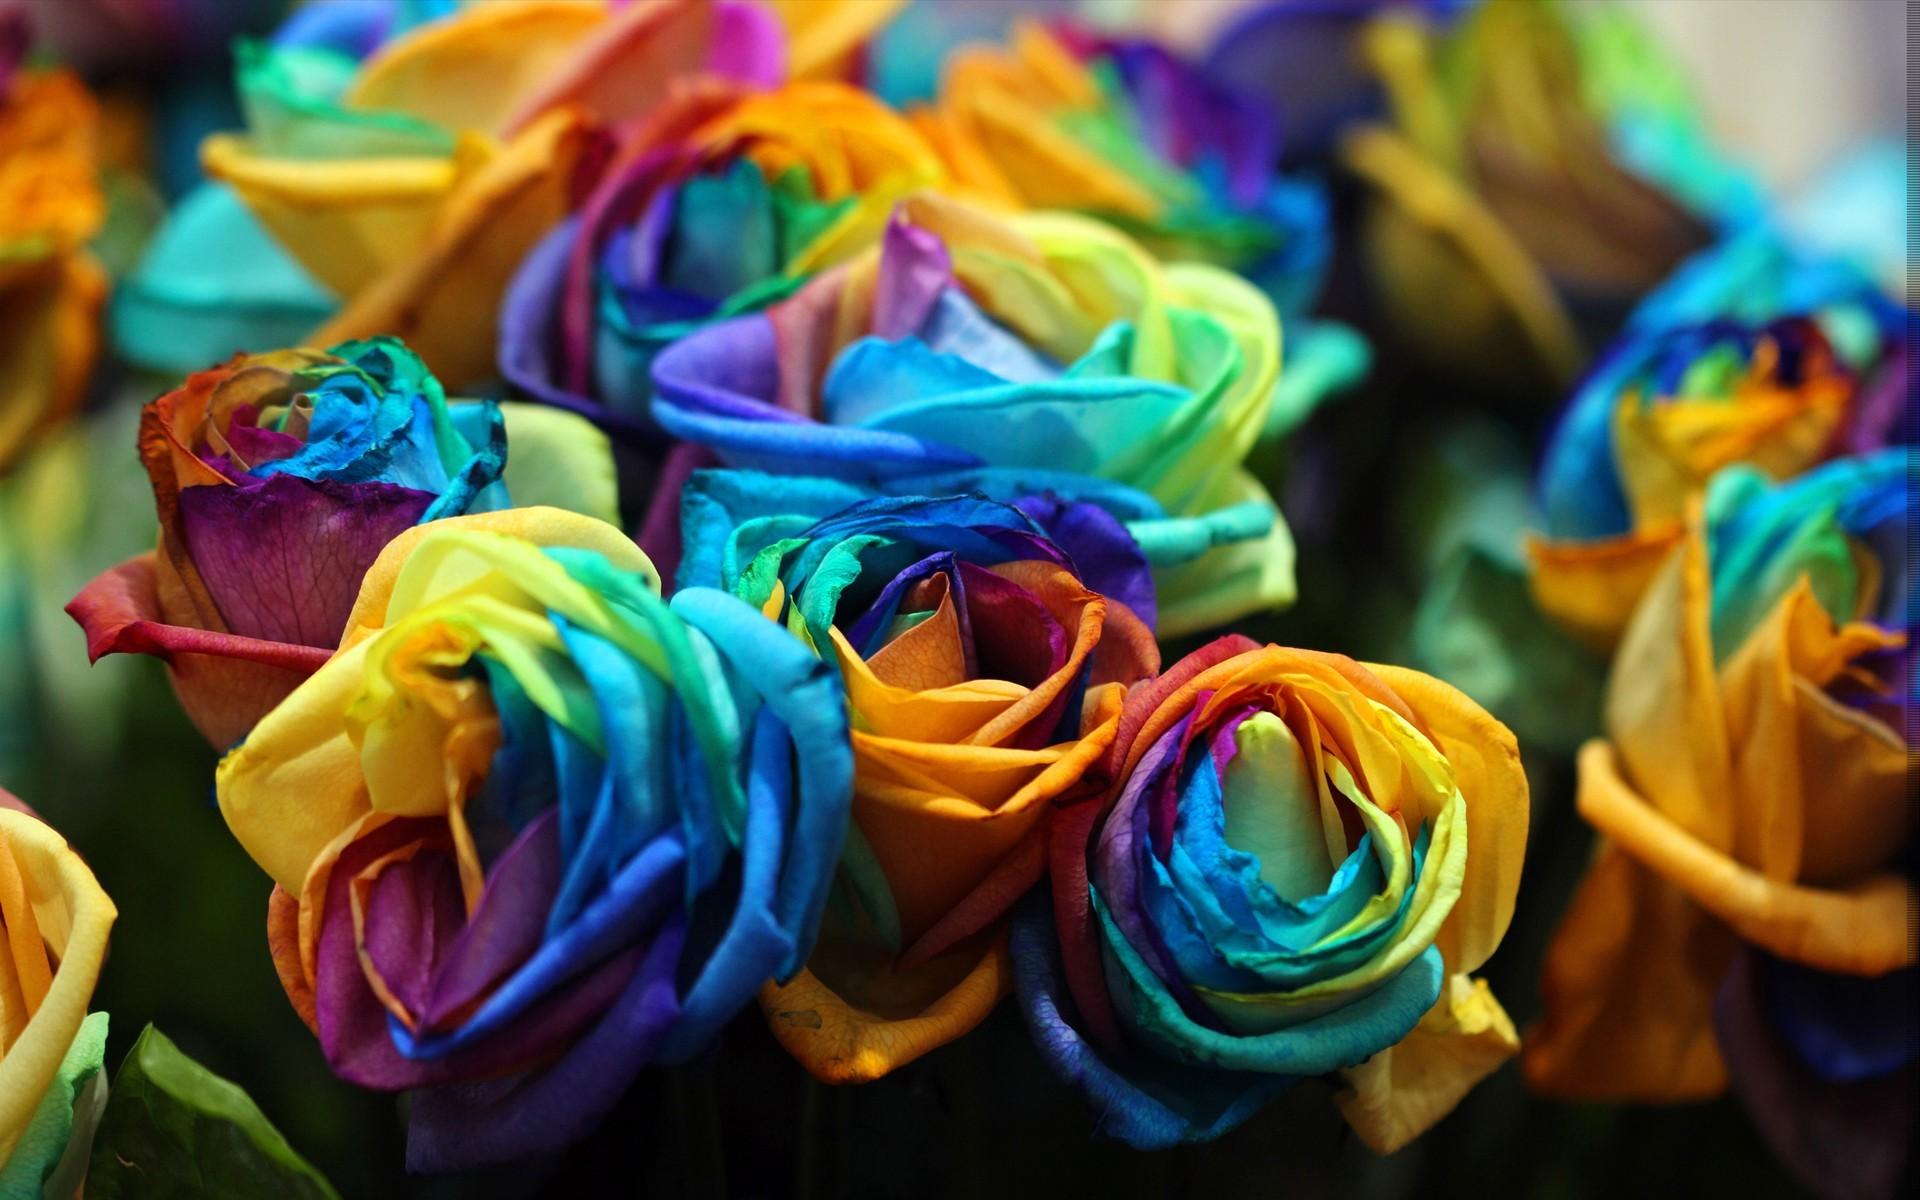 Colors nature flowers artistic wallpaper | | 22552 | WallpaperUP